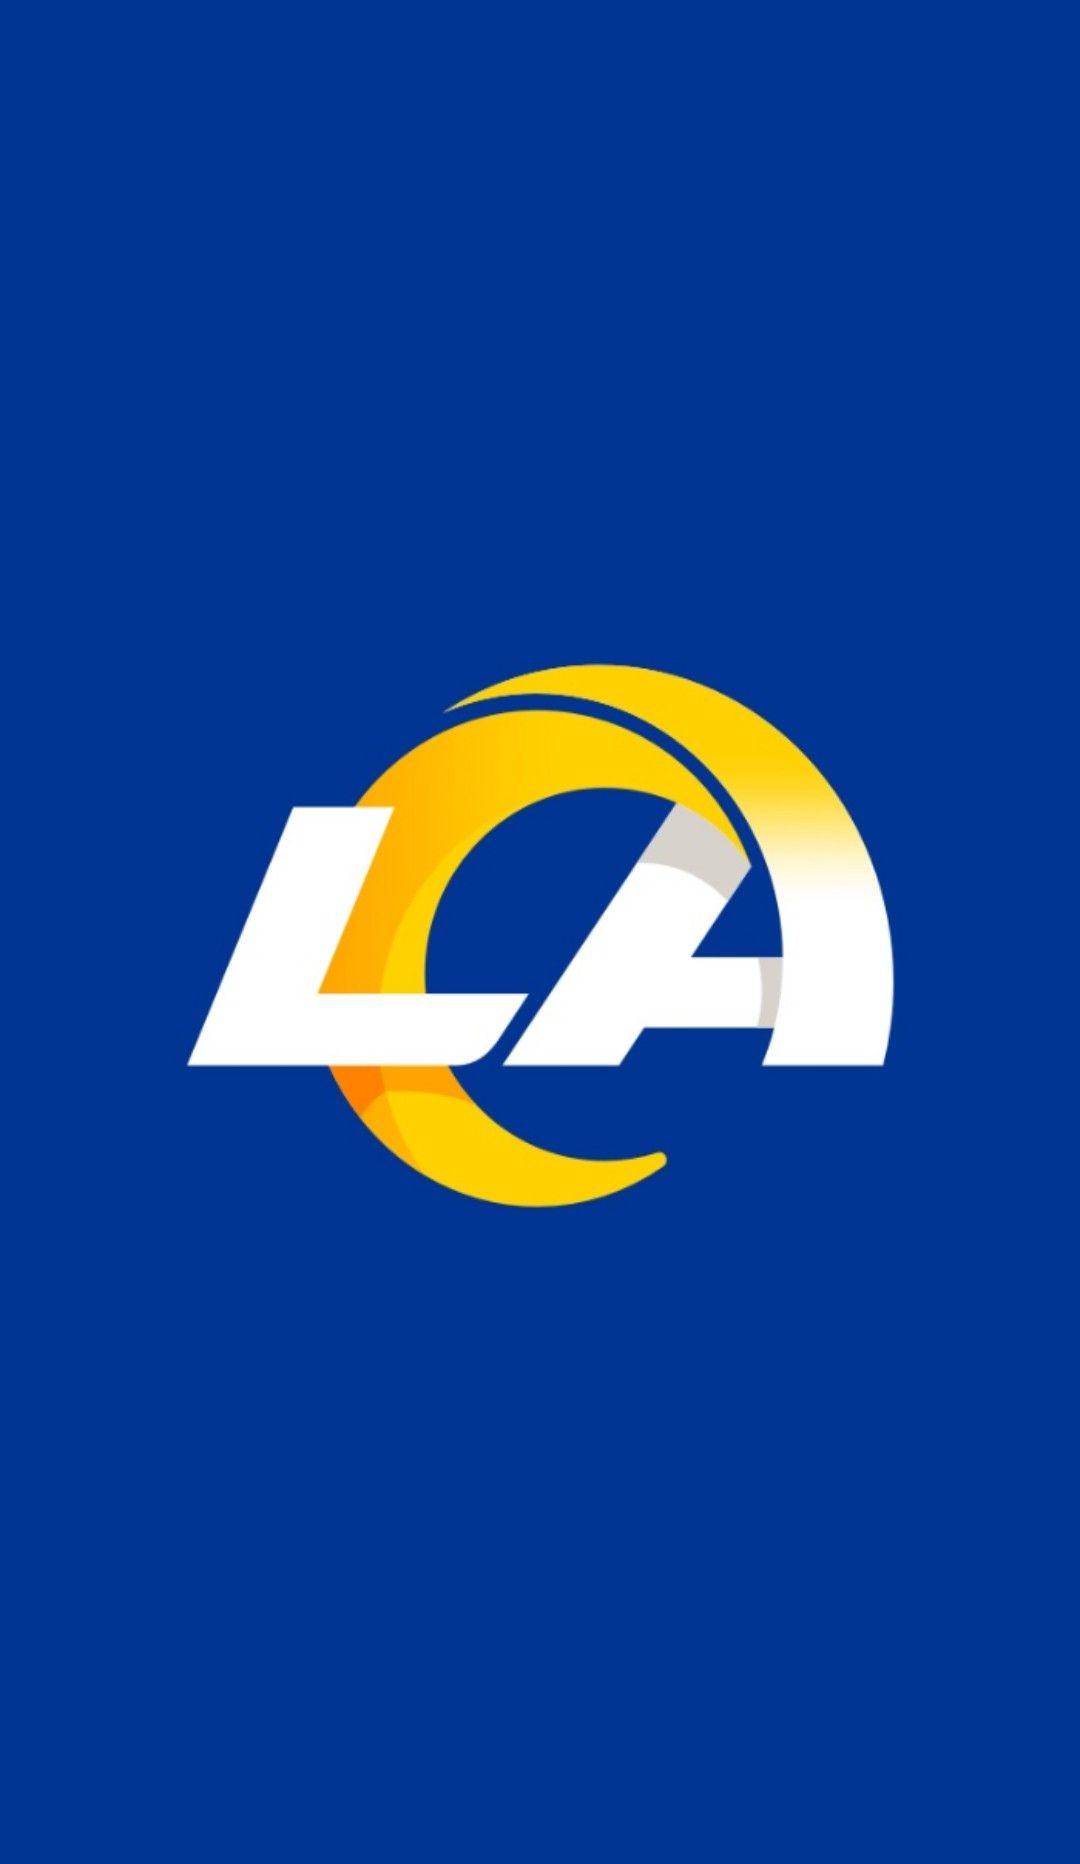 2020 Los Angeles Rams In 2020 Los Angeles Rams Los Angeles Rams Logo La Rams